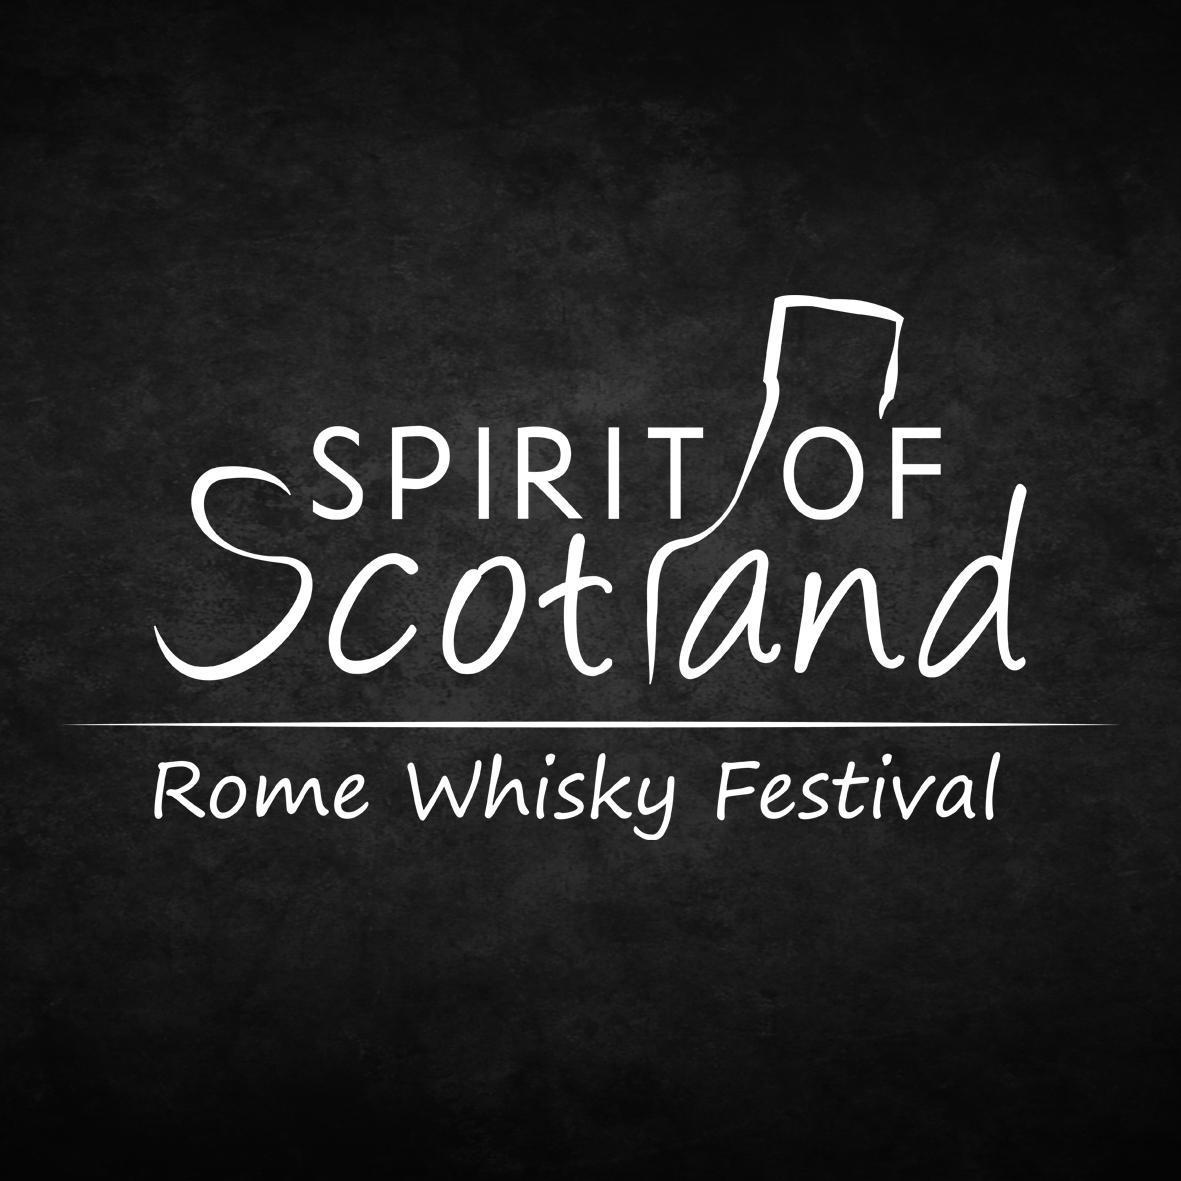 spirit of scotland whisky Roma 2017